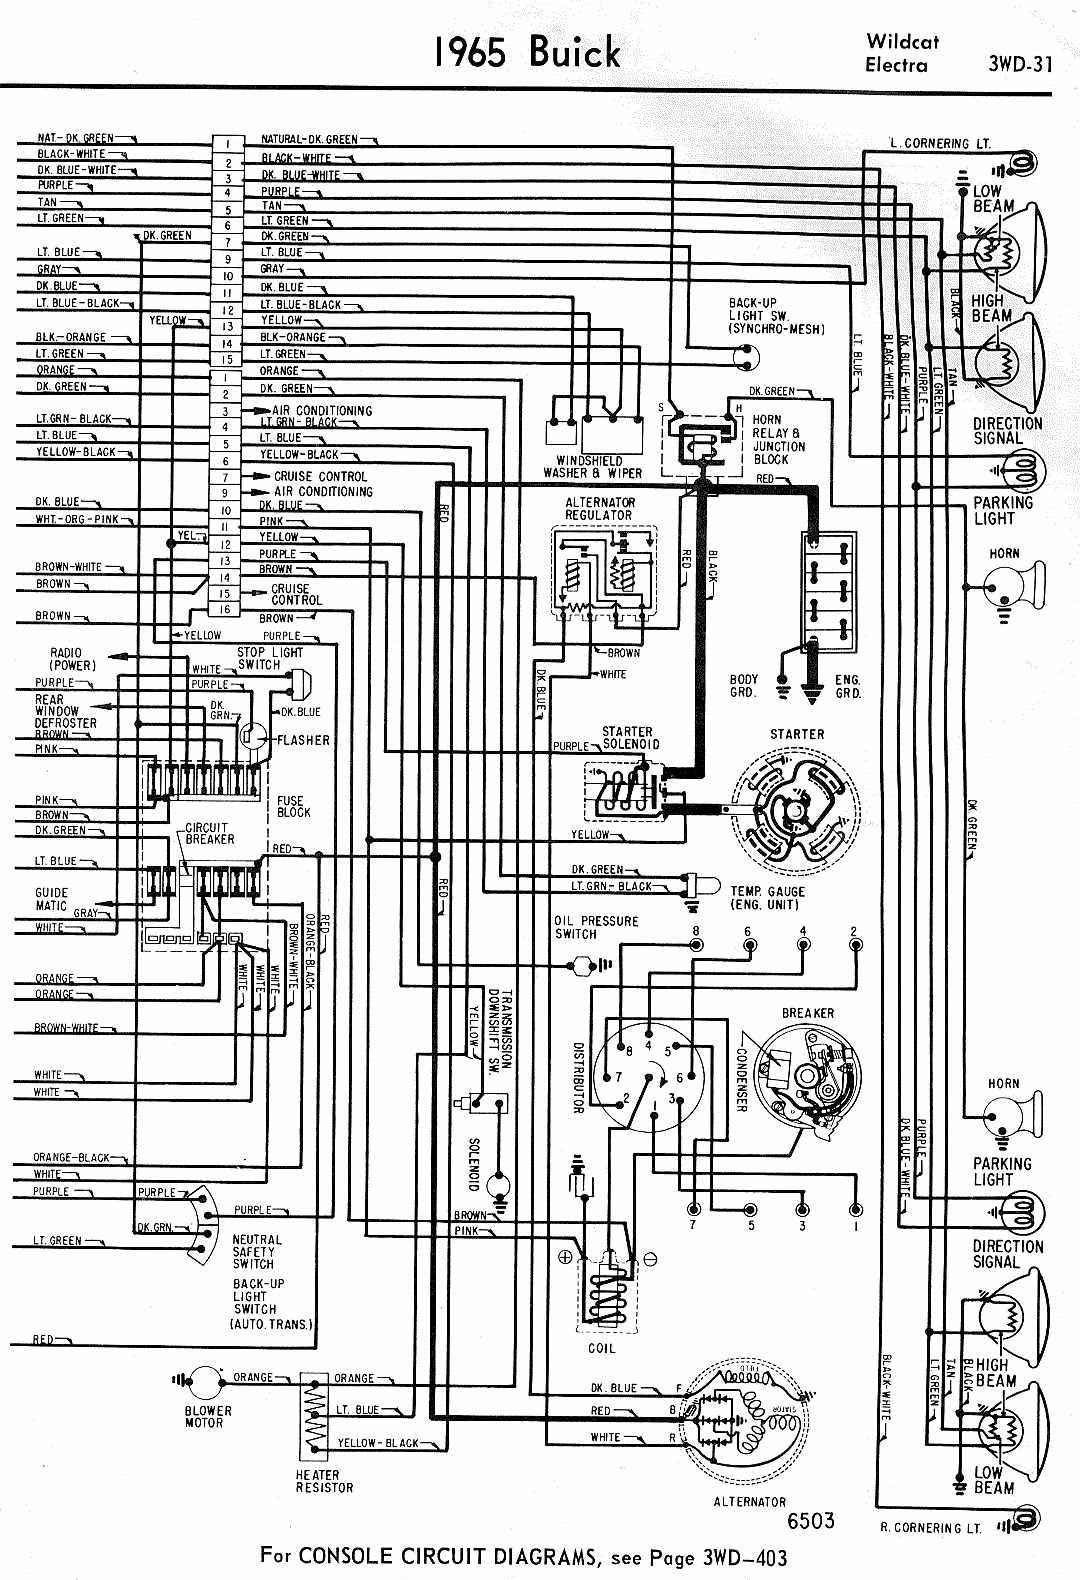 1989 Buick Skylark Wiring Diagram - Trusted Wiring Diagram